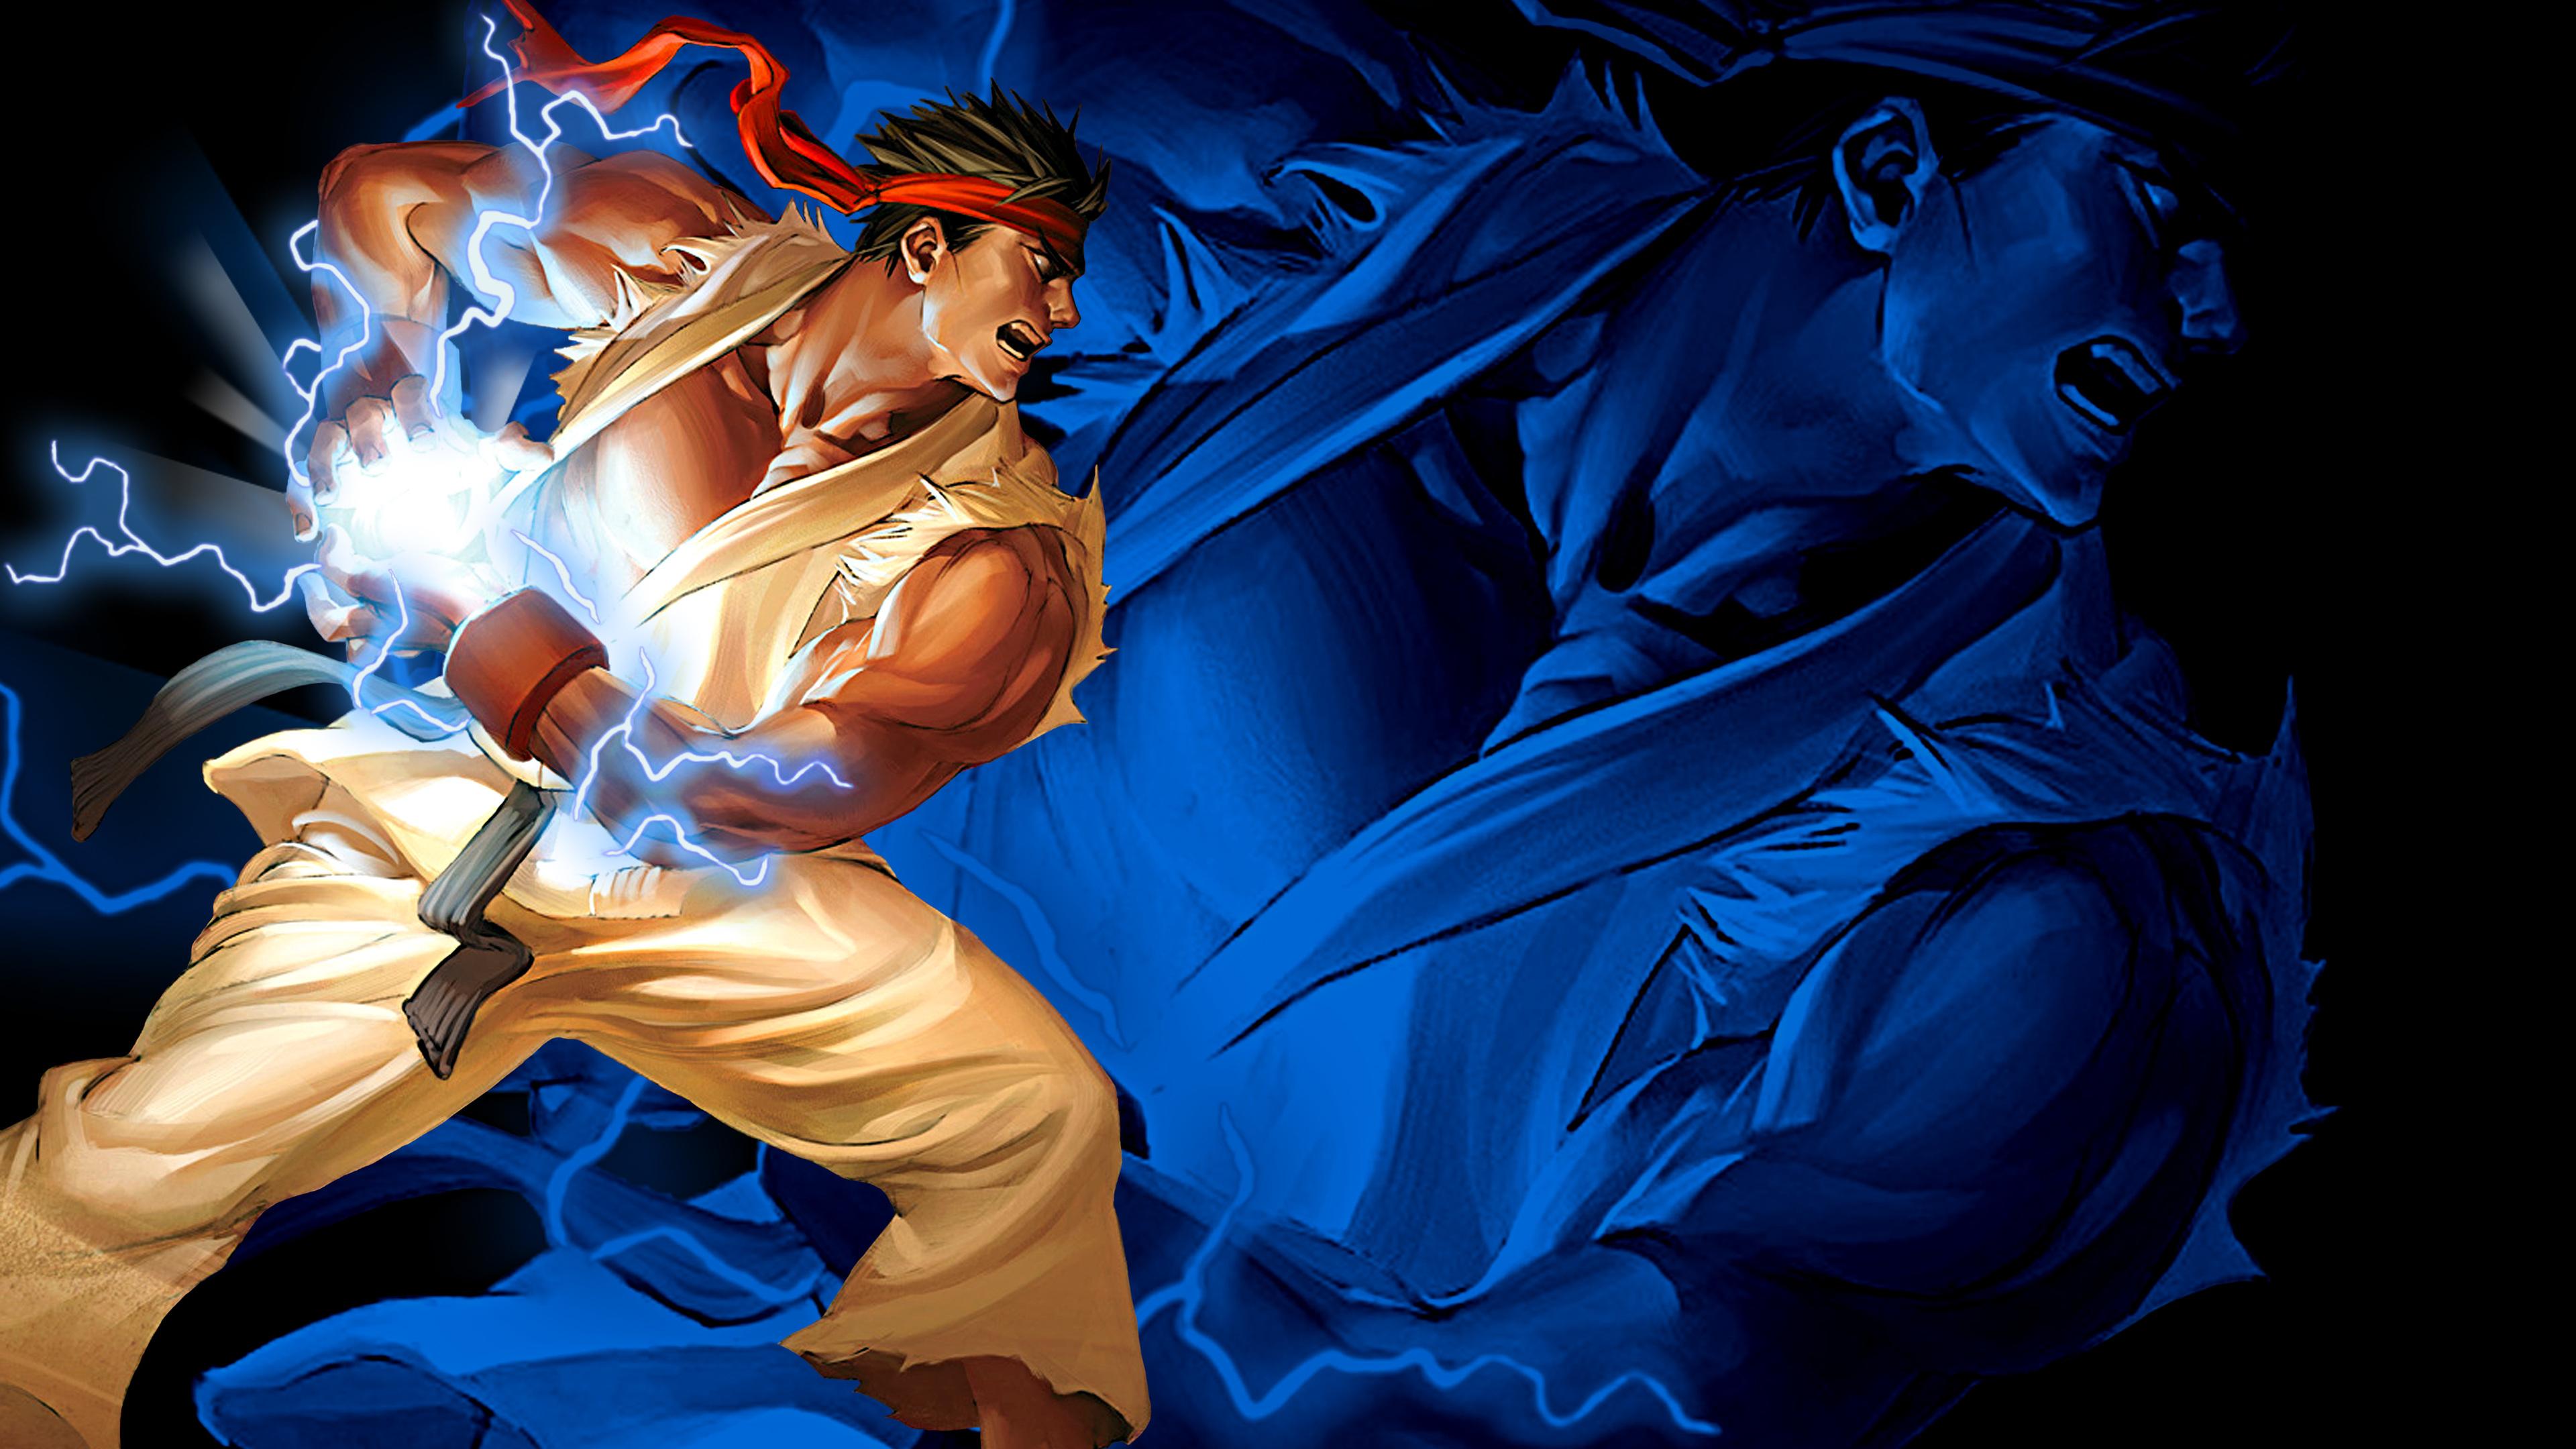 ryu hadouken street fighter 2 1537691669 - Ryu Hadouken Street Fighter 2 - street fighter v wallpapers, hd-wallpapers, games wallpapers, 5k wallpapers, 4k-wallpapers, 2016 games wallpapers